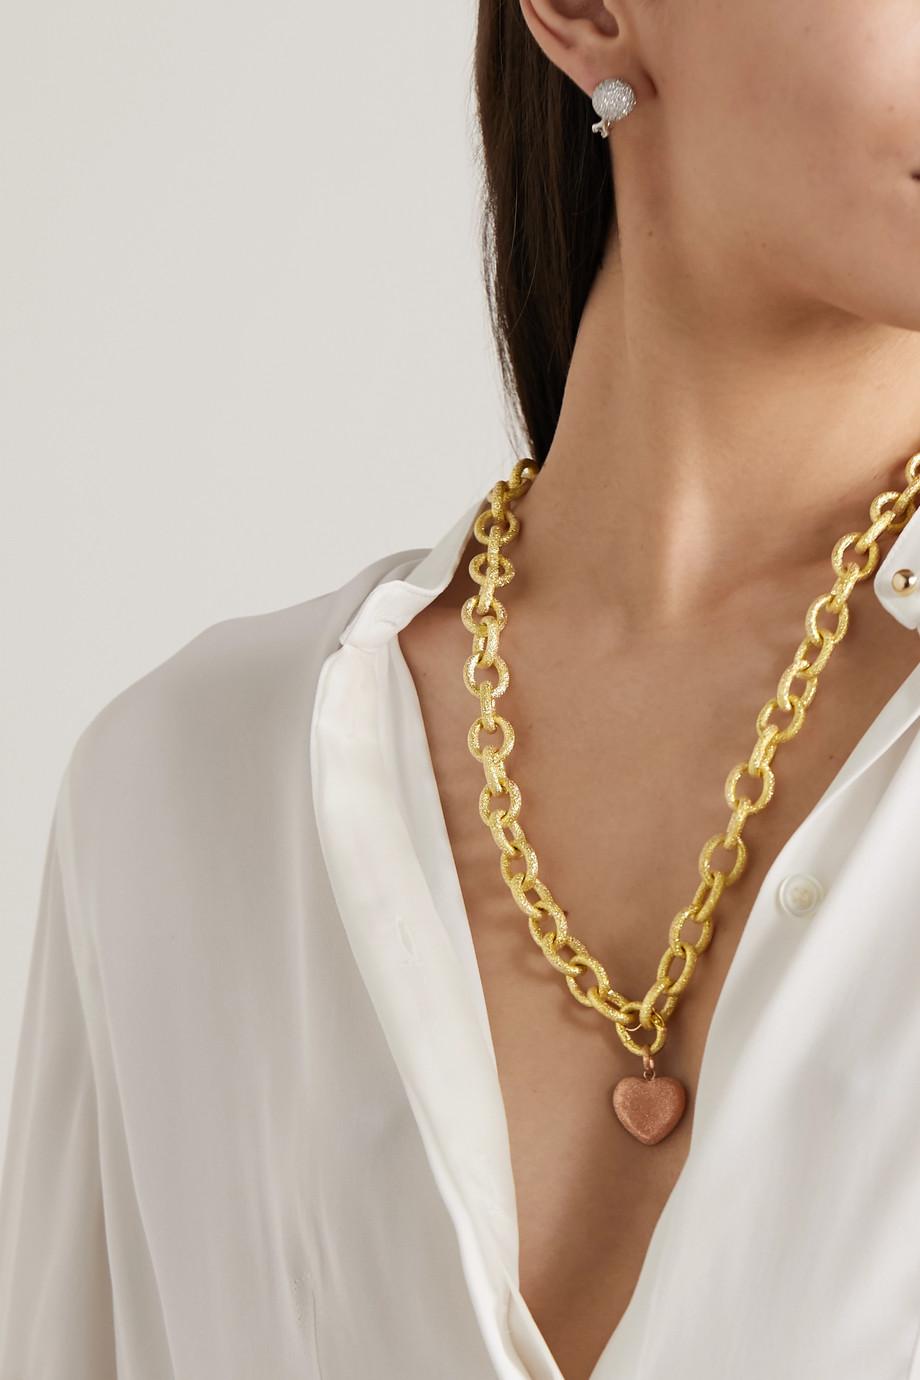 Carolina Bucci Florentine 18-karat yellow and rose gold necklace